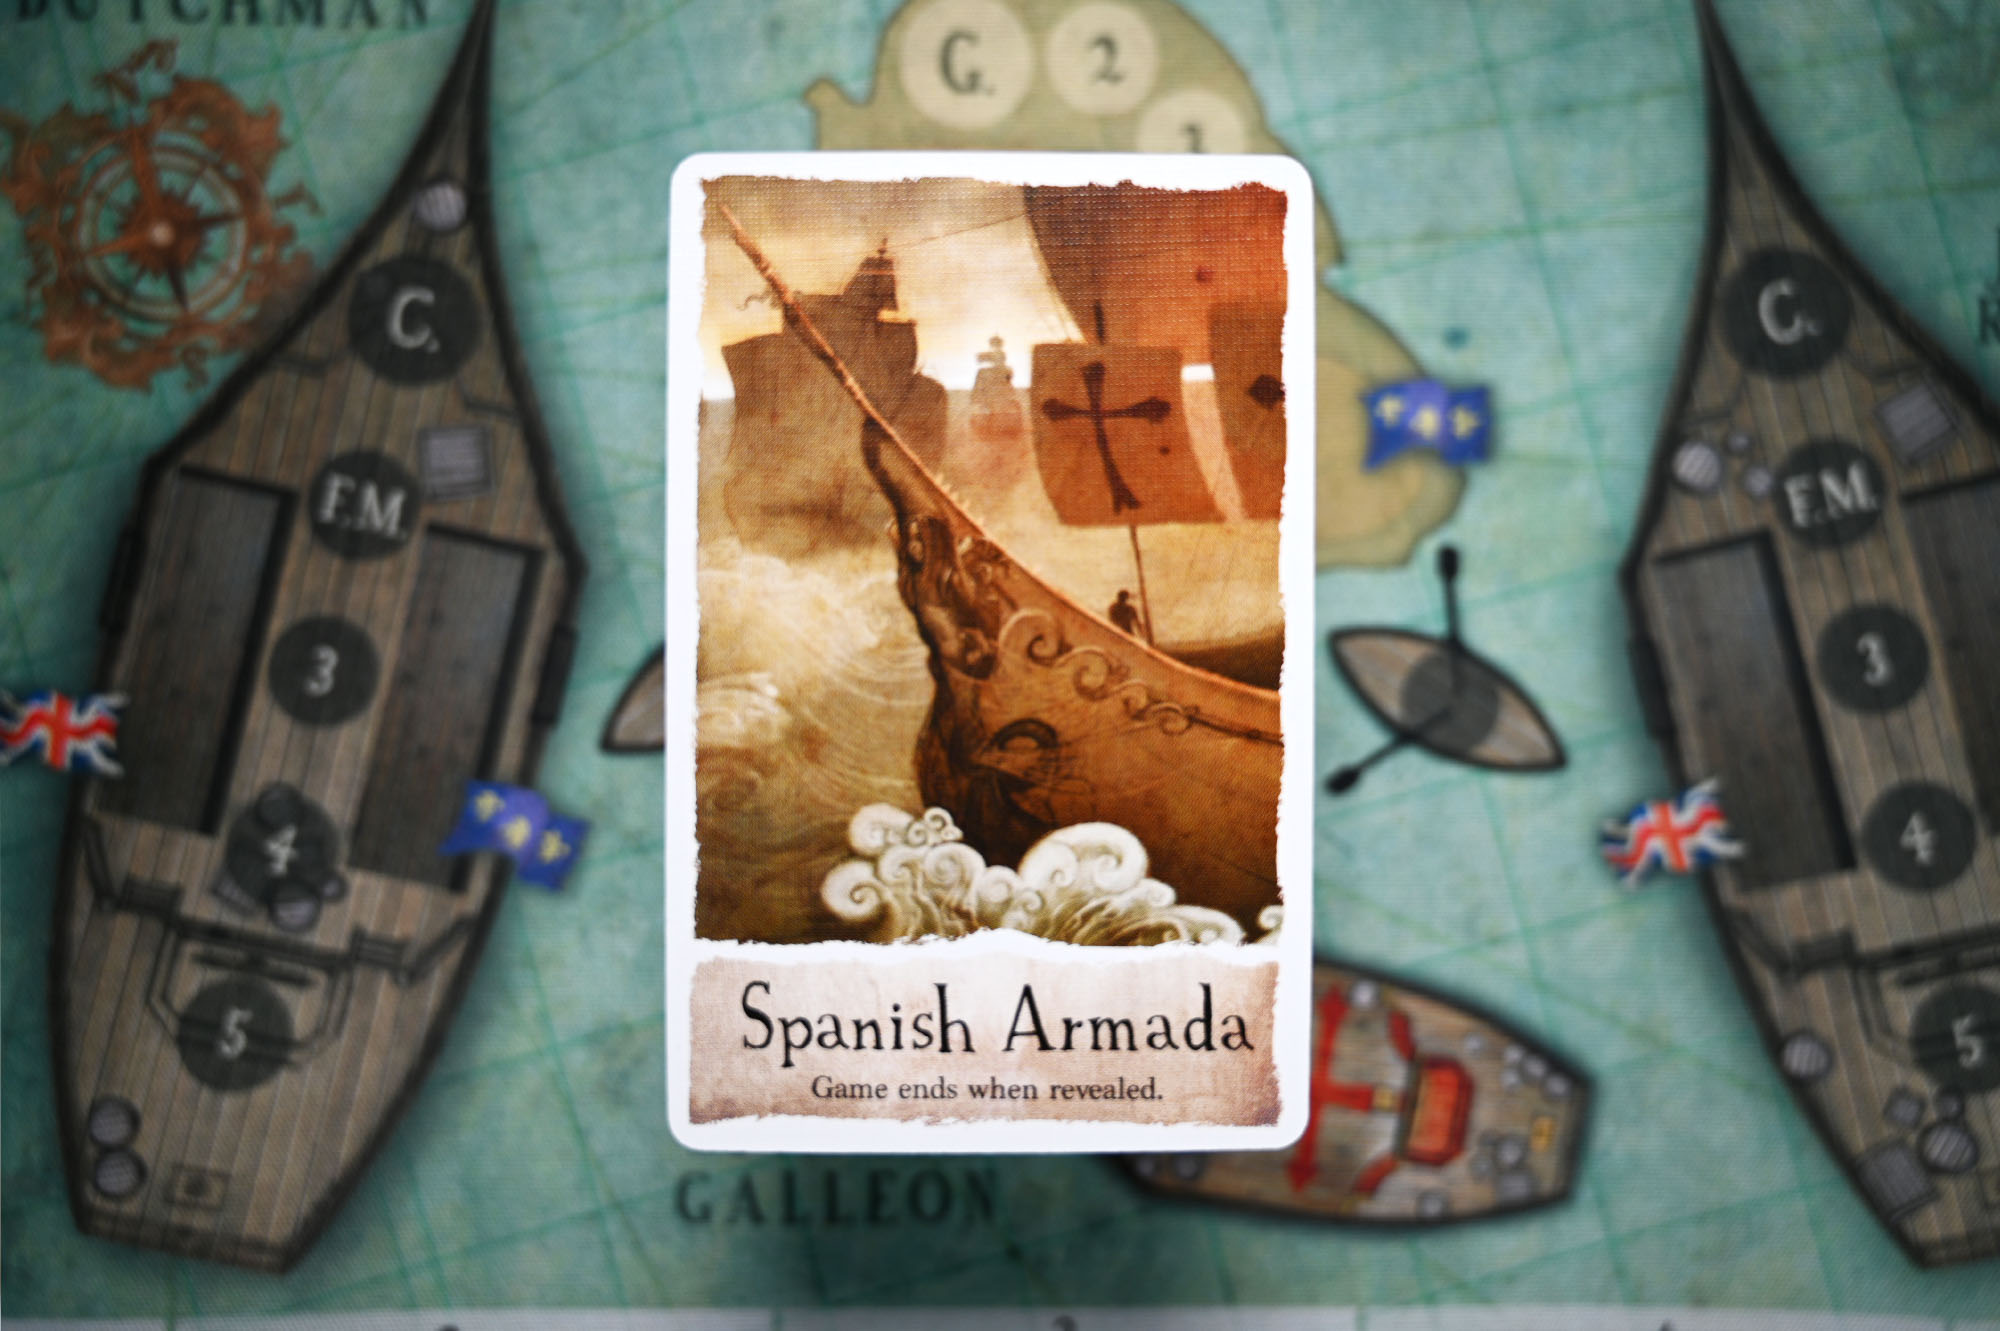 Sarah Keele: Art in Board Games #47 — More Games Please